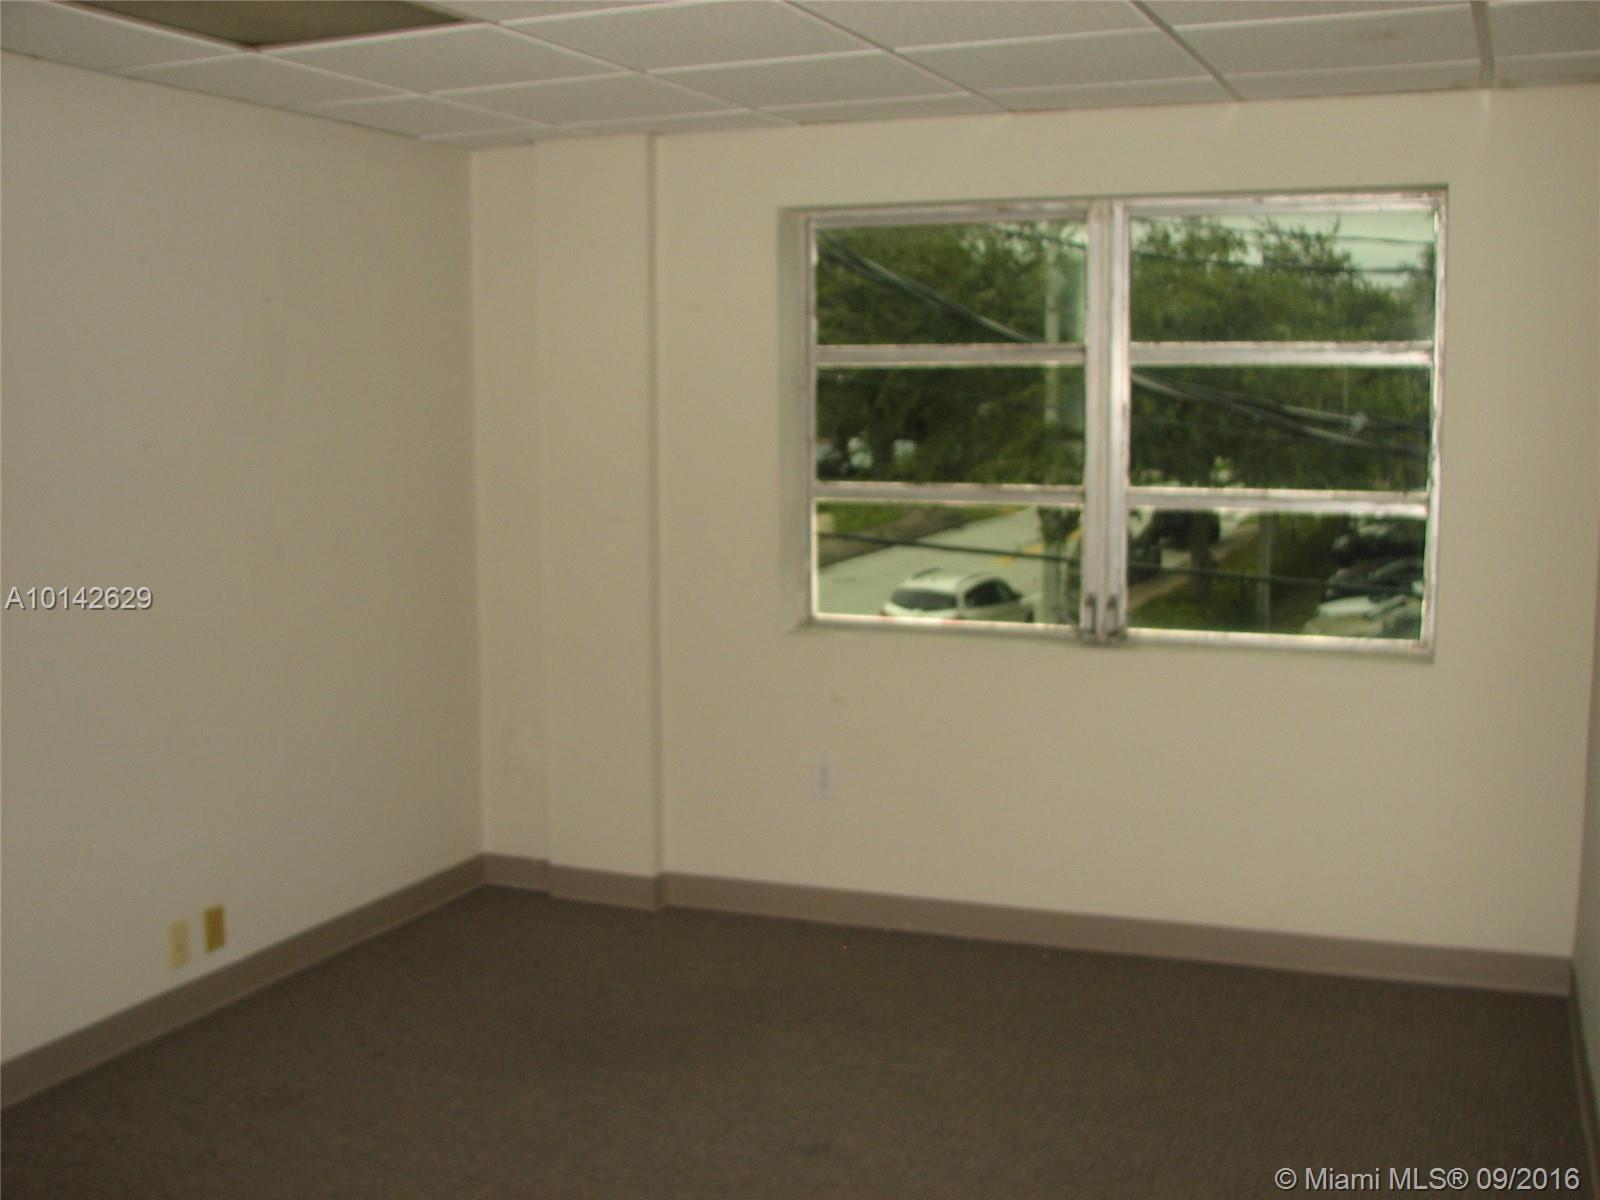 475 Biltmore Way # 202, Coral Gables, FL 33134